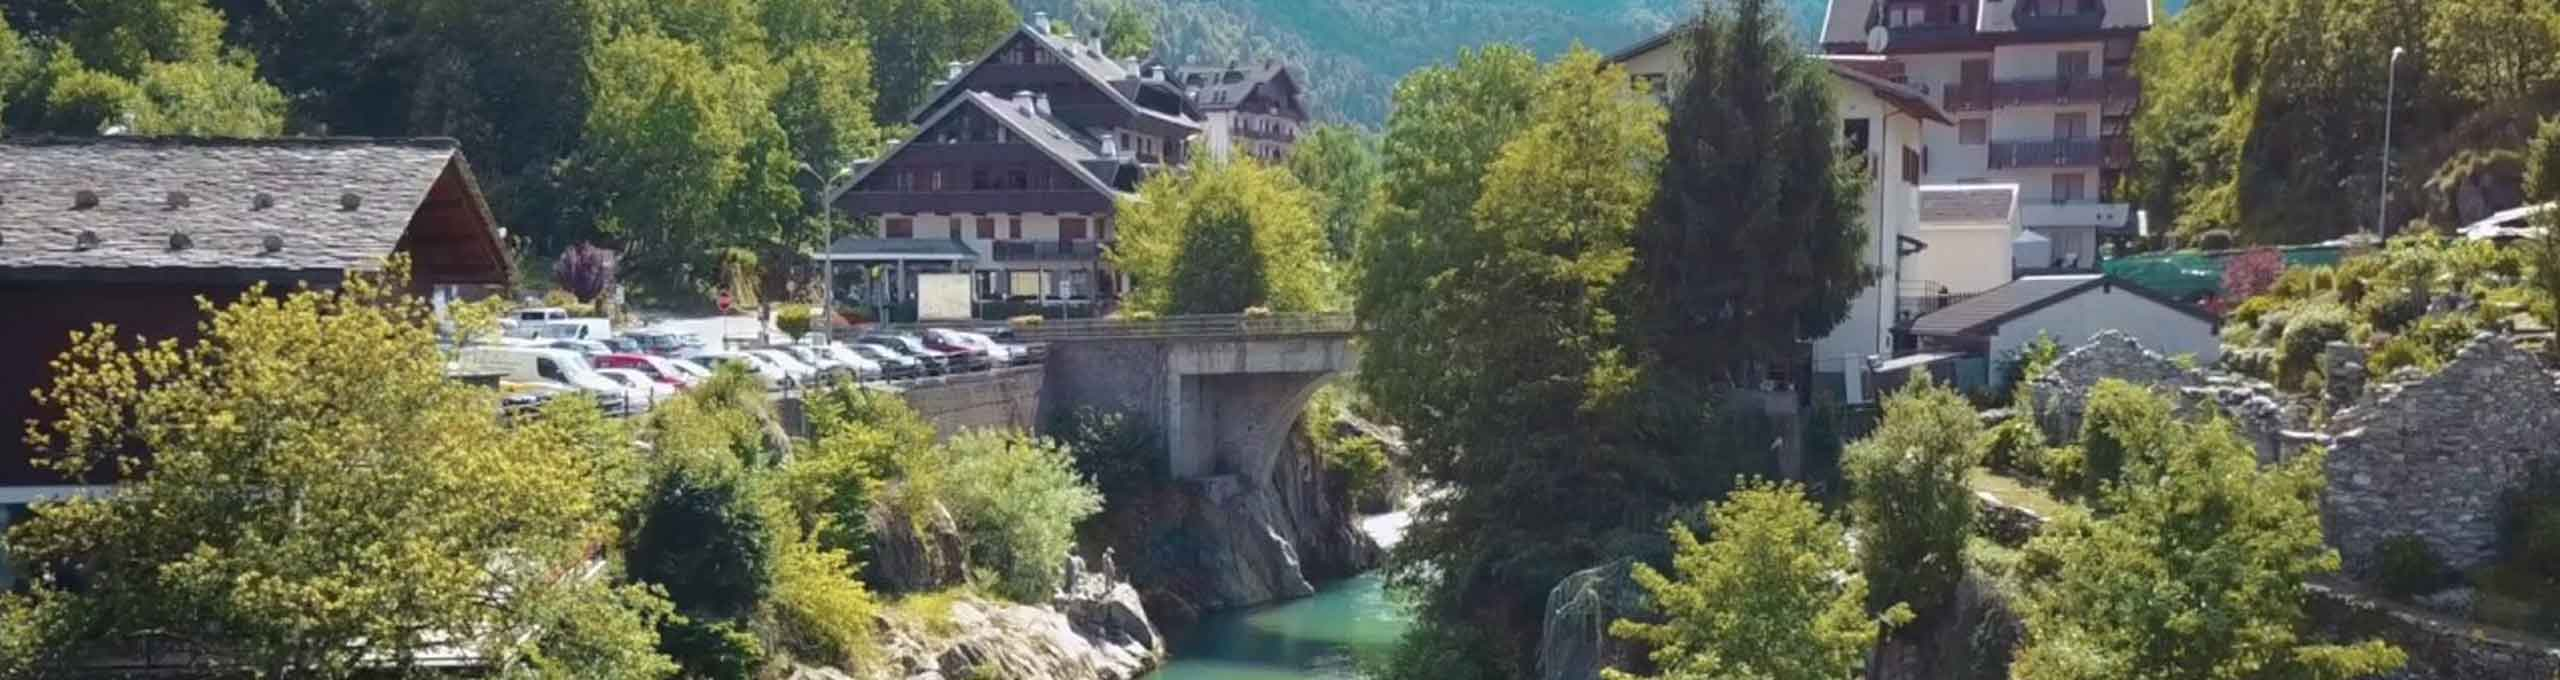 Scopello - Alpe di Mera - Valsesia